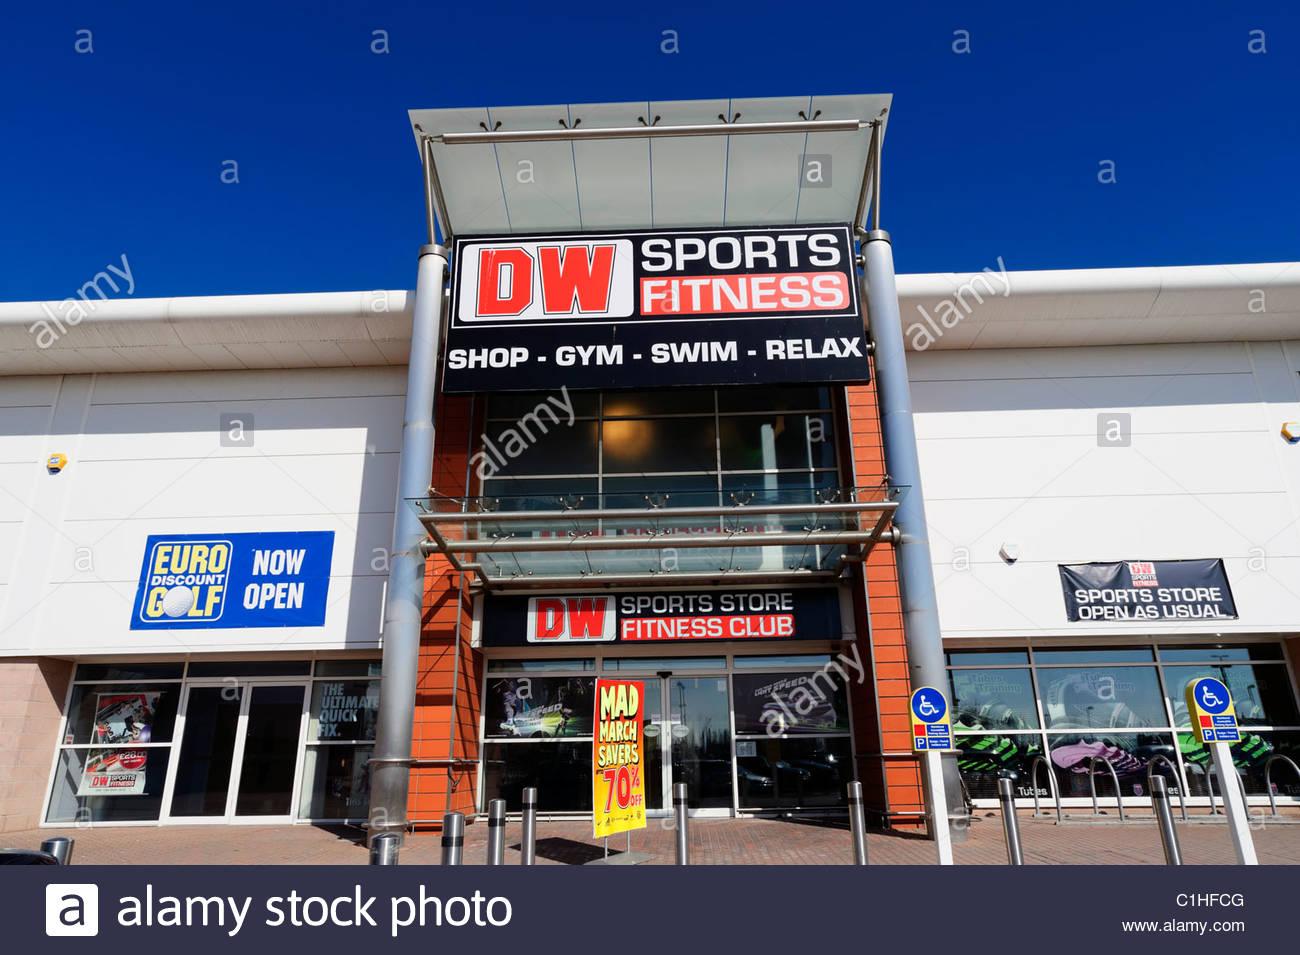 dw sports fitness gym shop in gloucester uk dw fitness. Black Bedroom Furniture Sets. Home Design Ideas